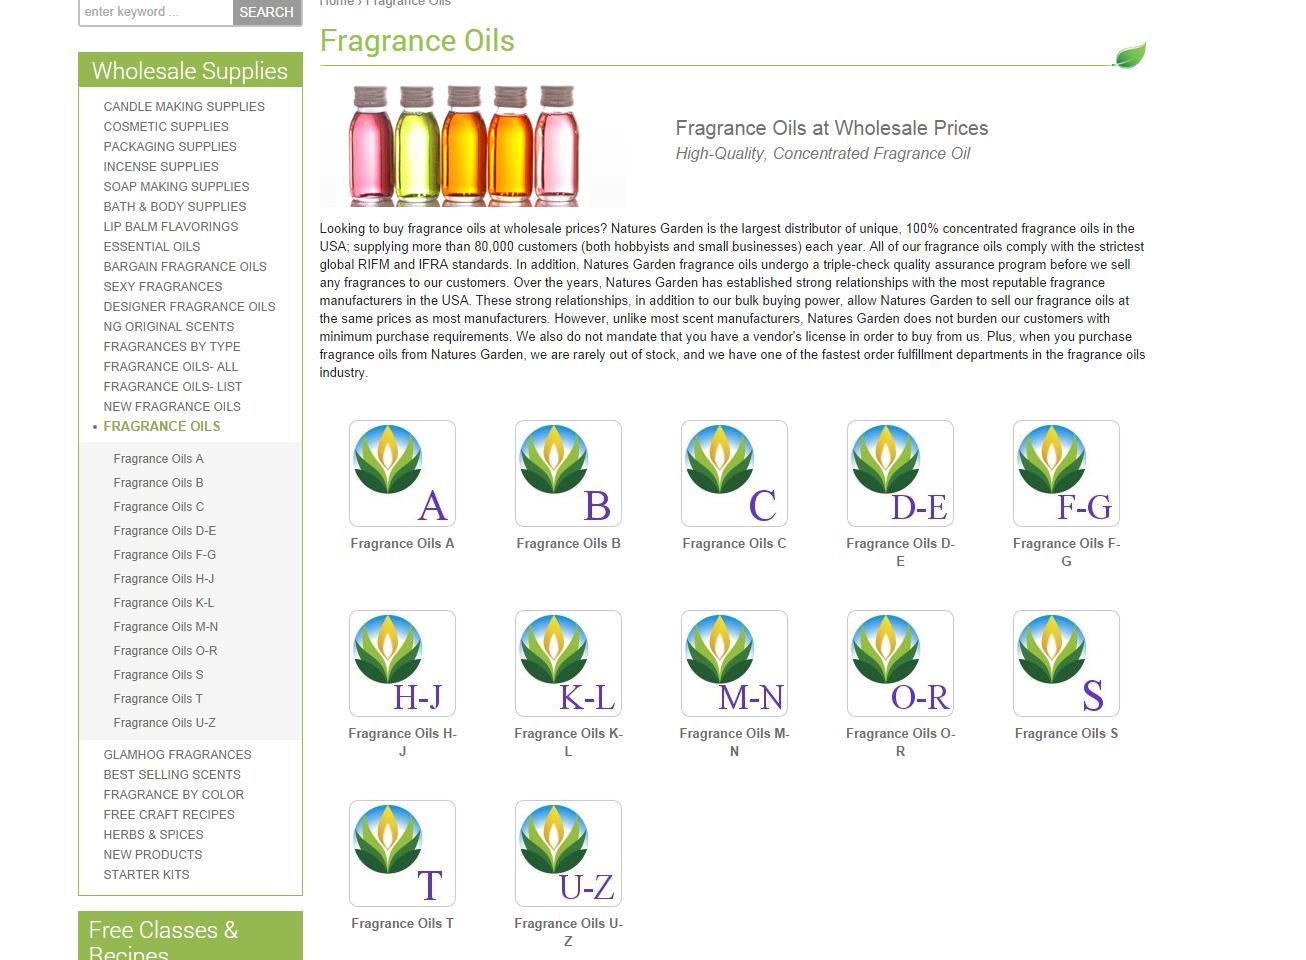 fragrance oils a-z